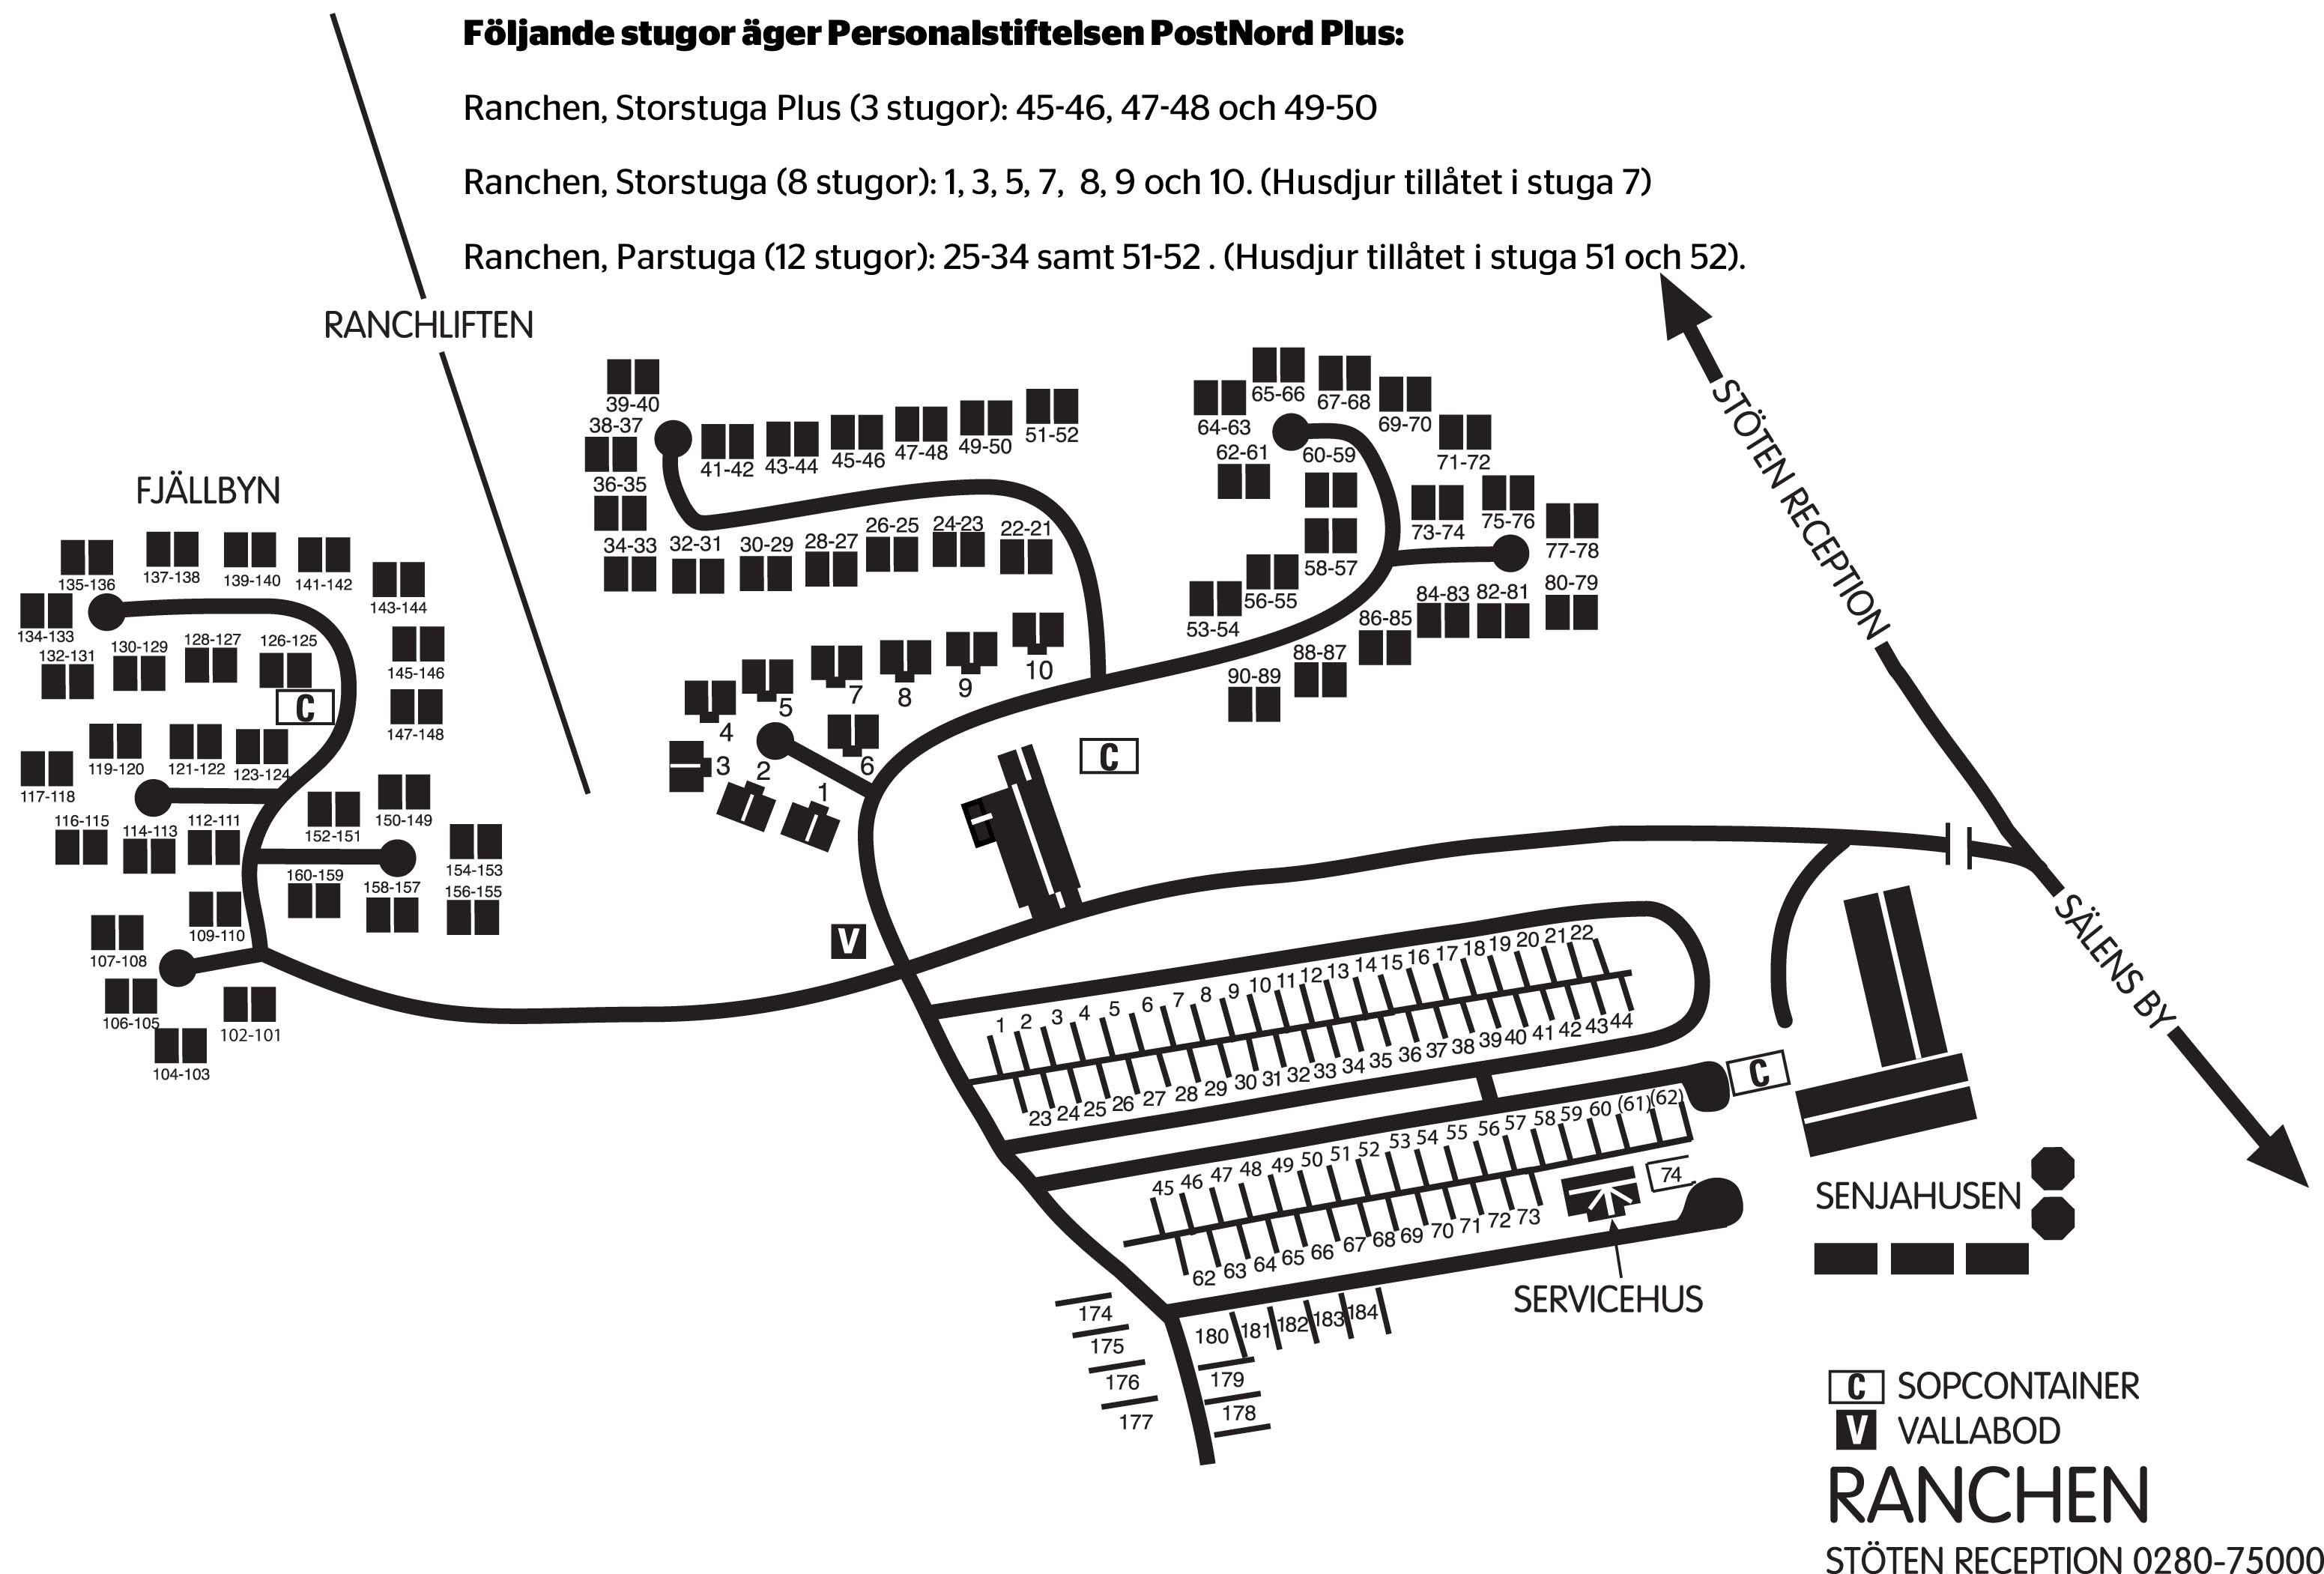 Sälenhornet Resort Ranchen Storstuga Plus